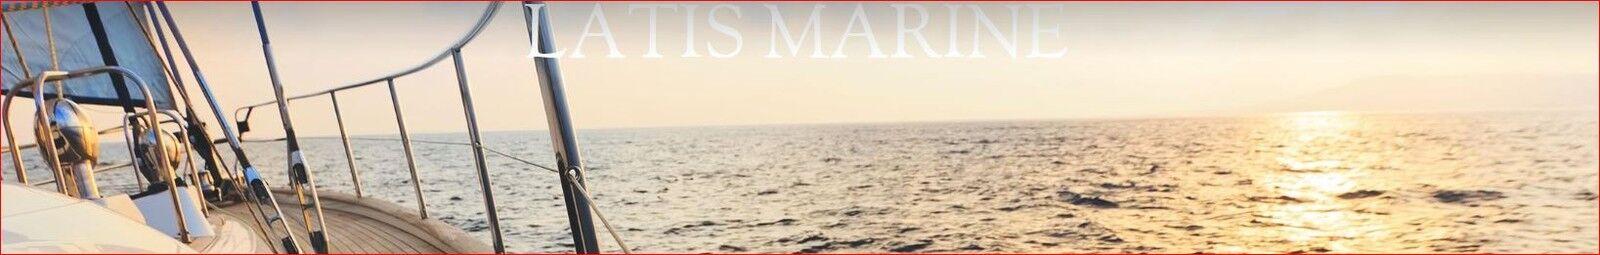 Latis Marine